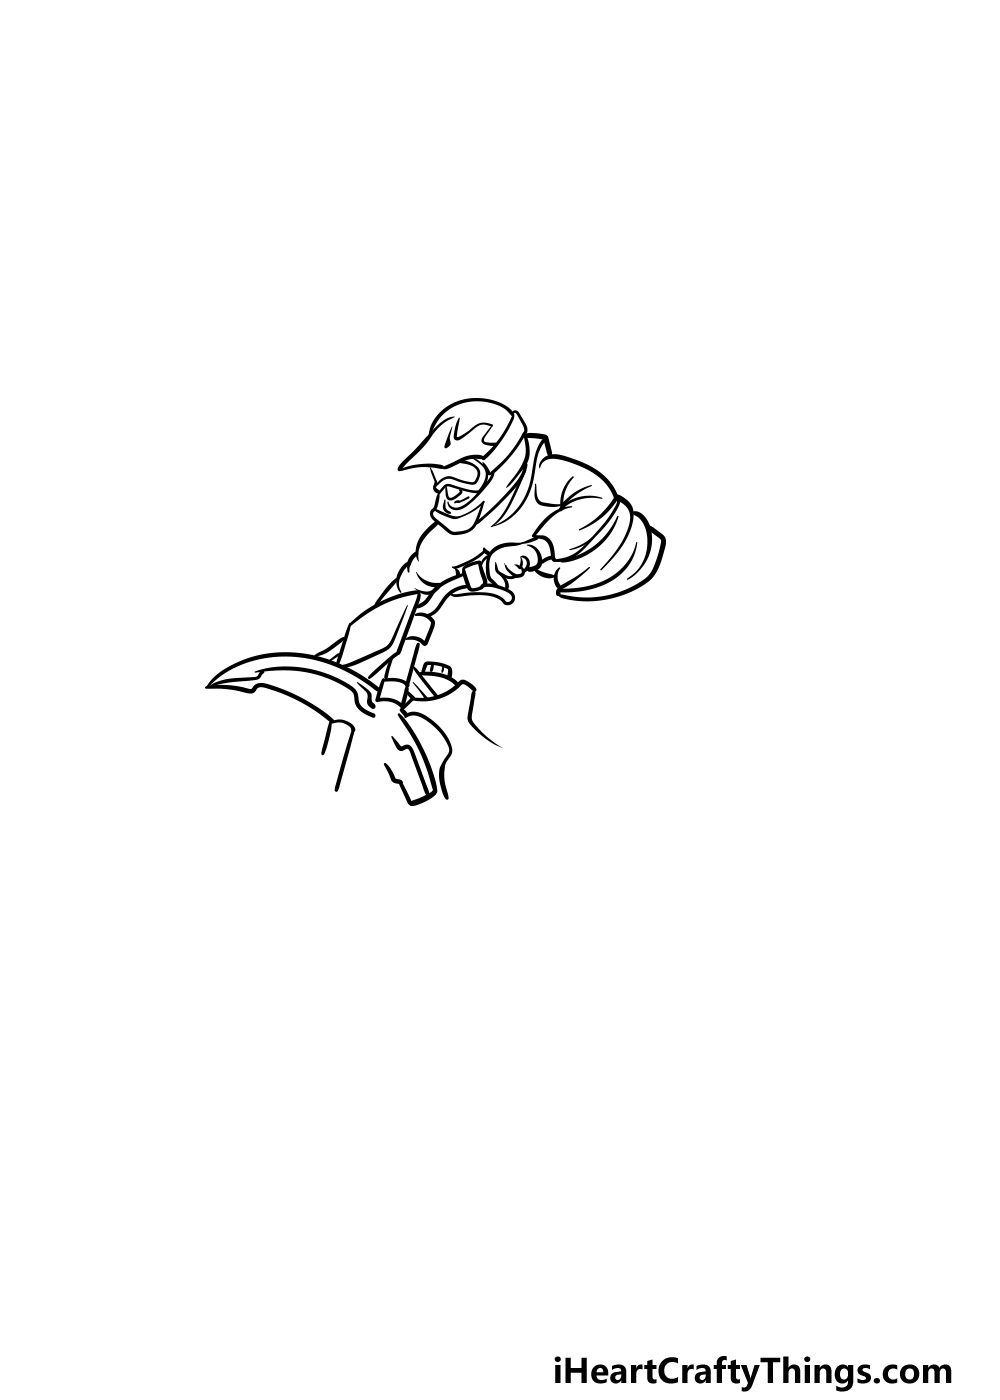 drawing a dirt bike step 2